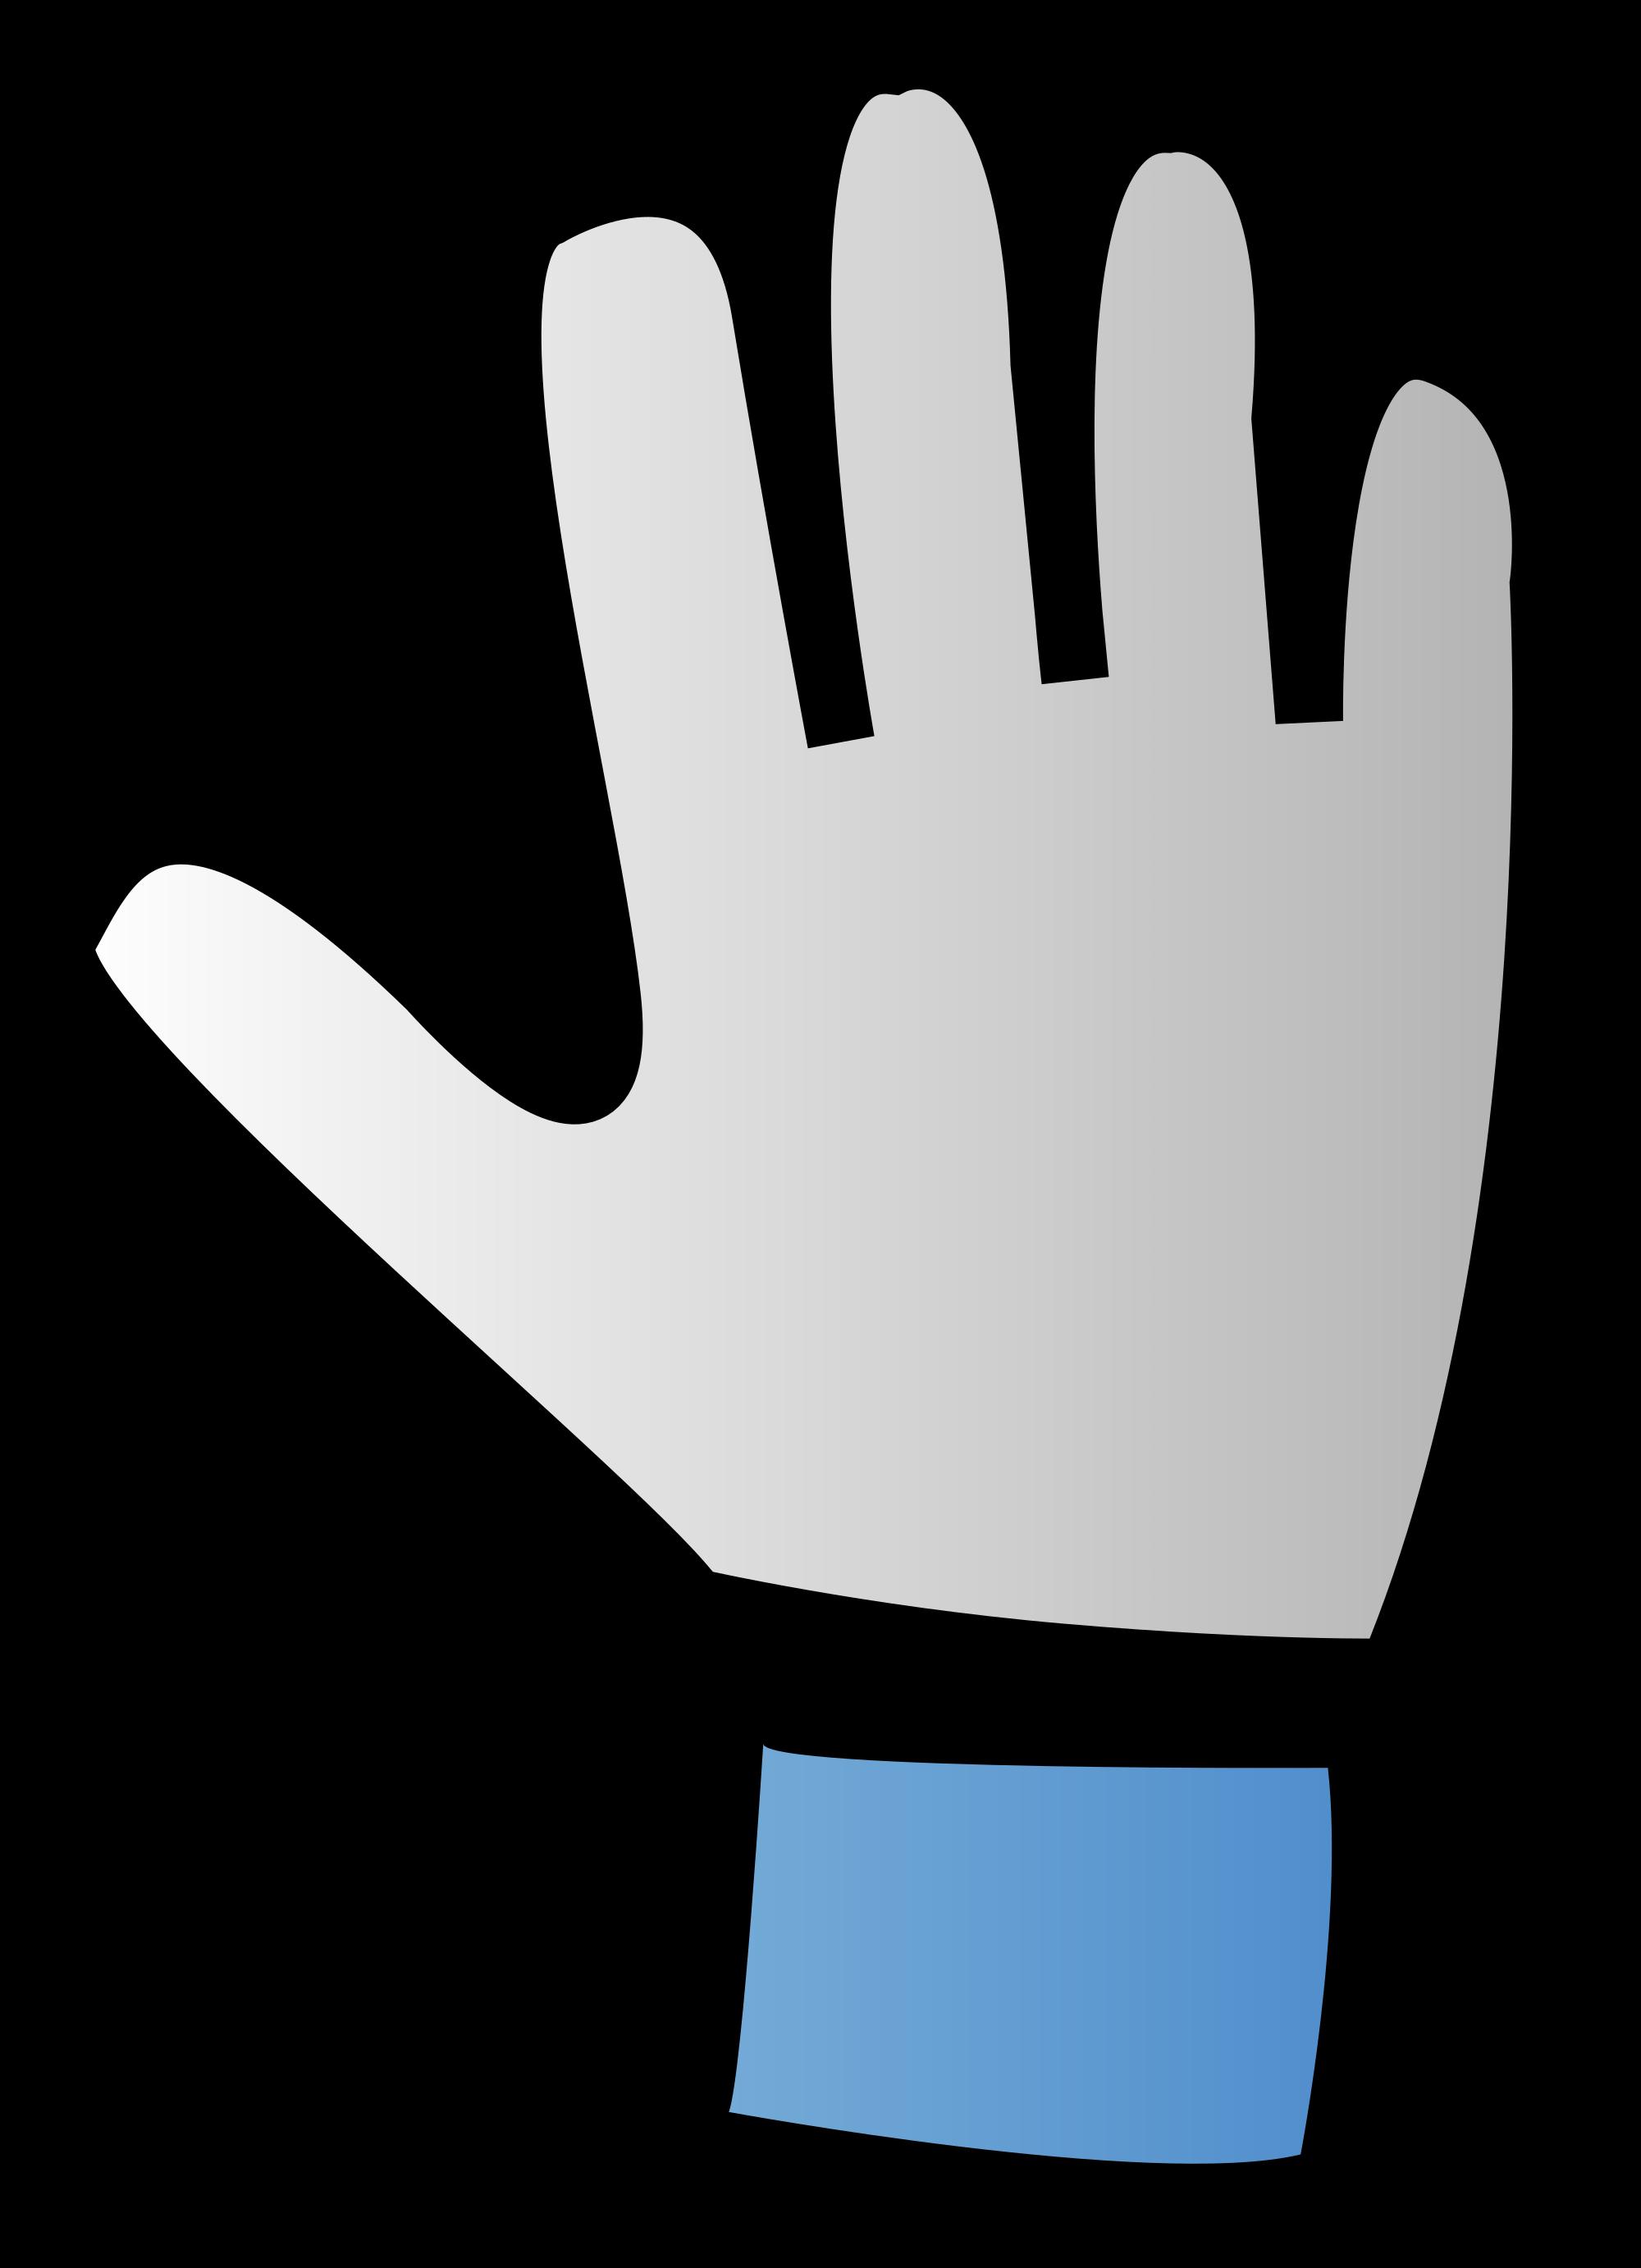 Goalkeeper icon svg wikimedia. Glove clipart file